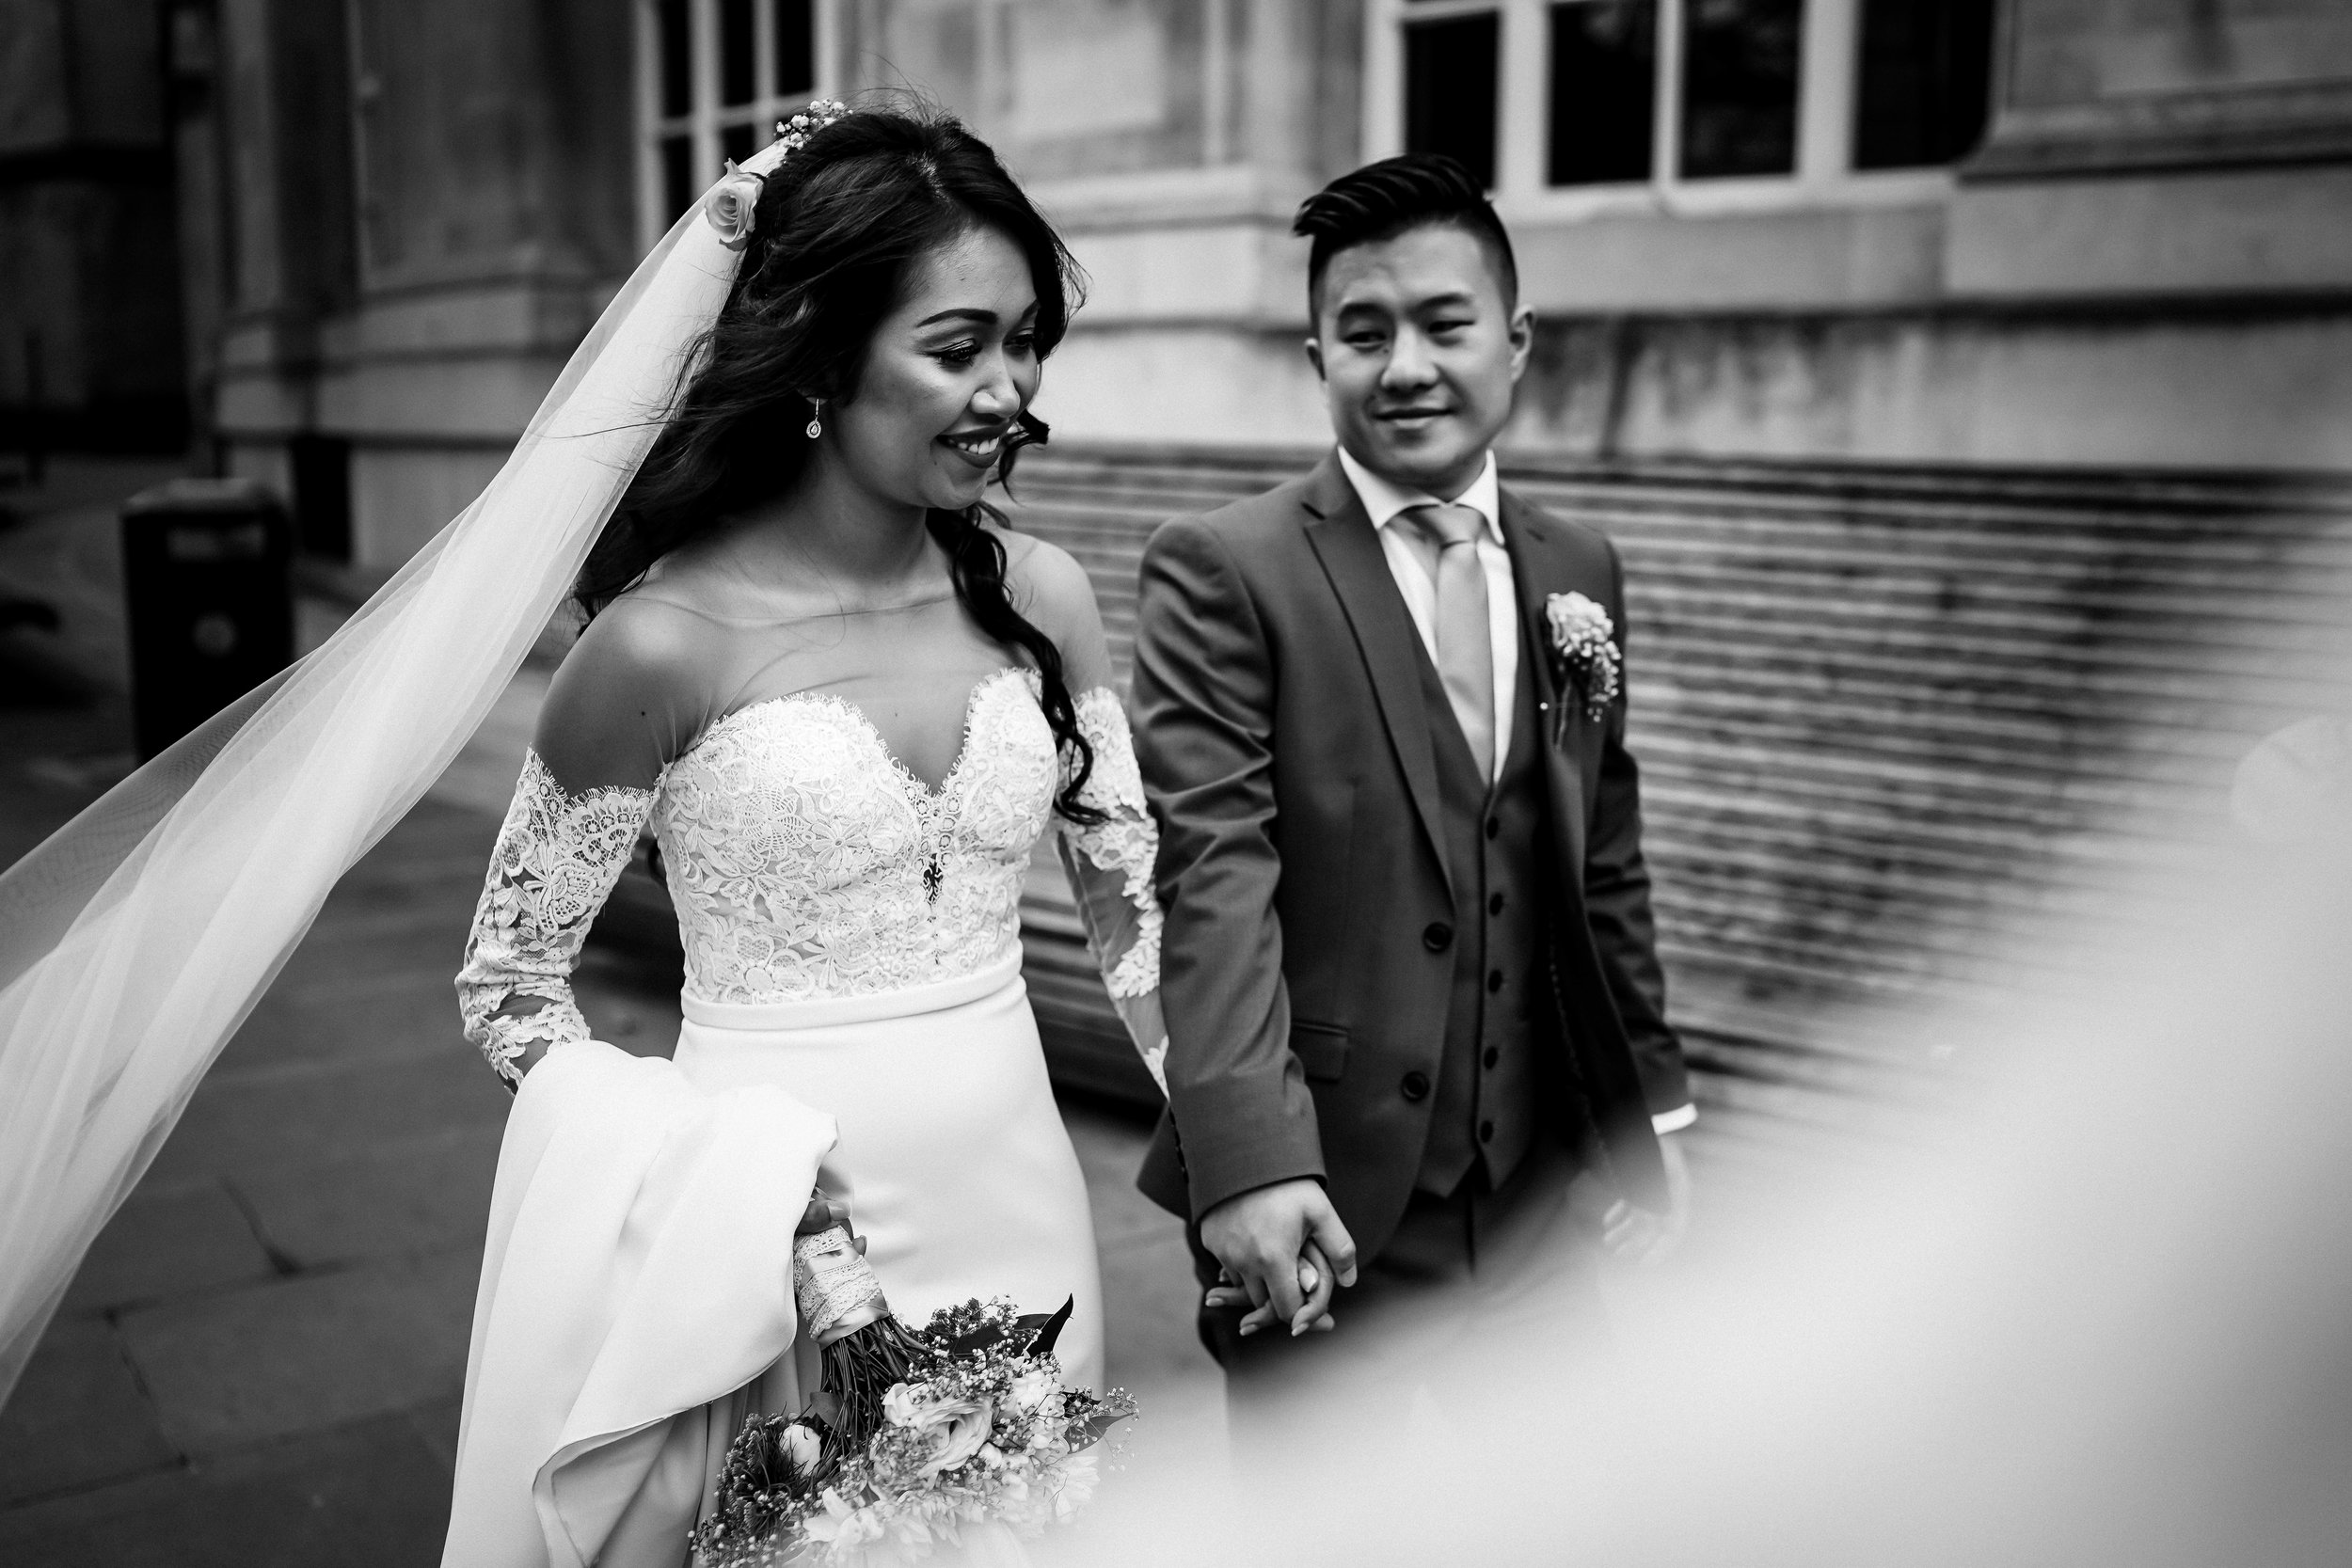 Chinese Wedding Photography Manchester wedding photographer Cheshire - 031.jpg